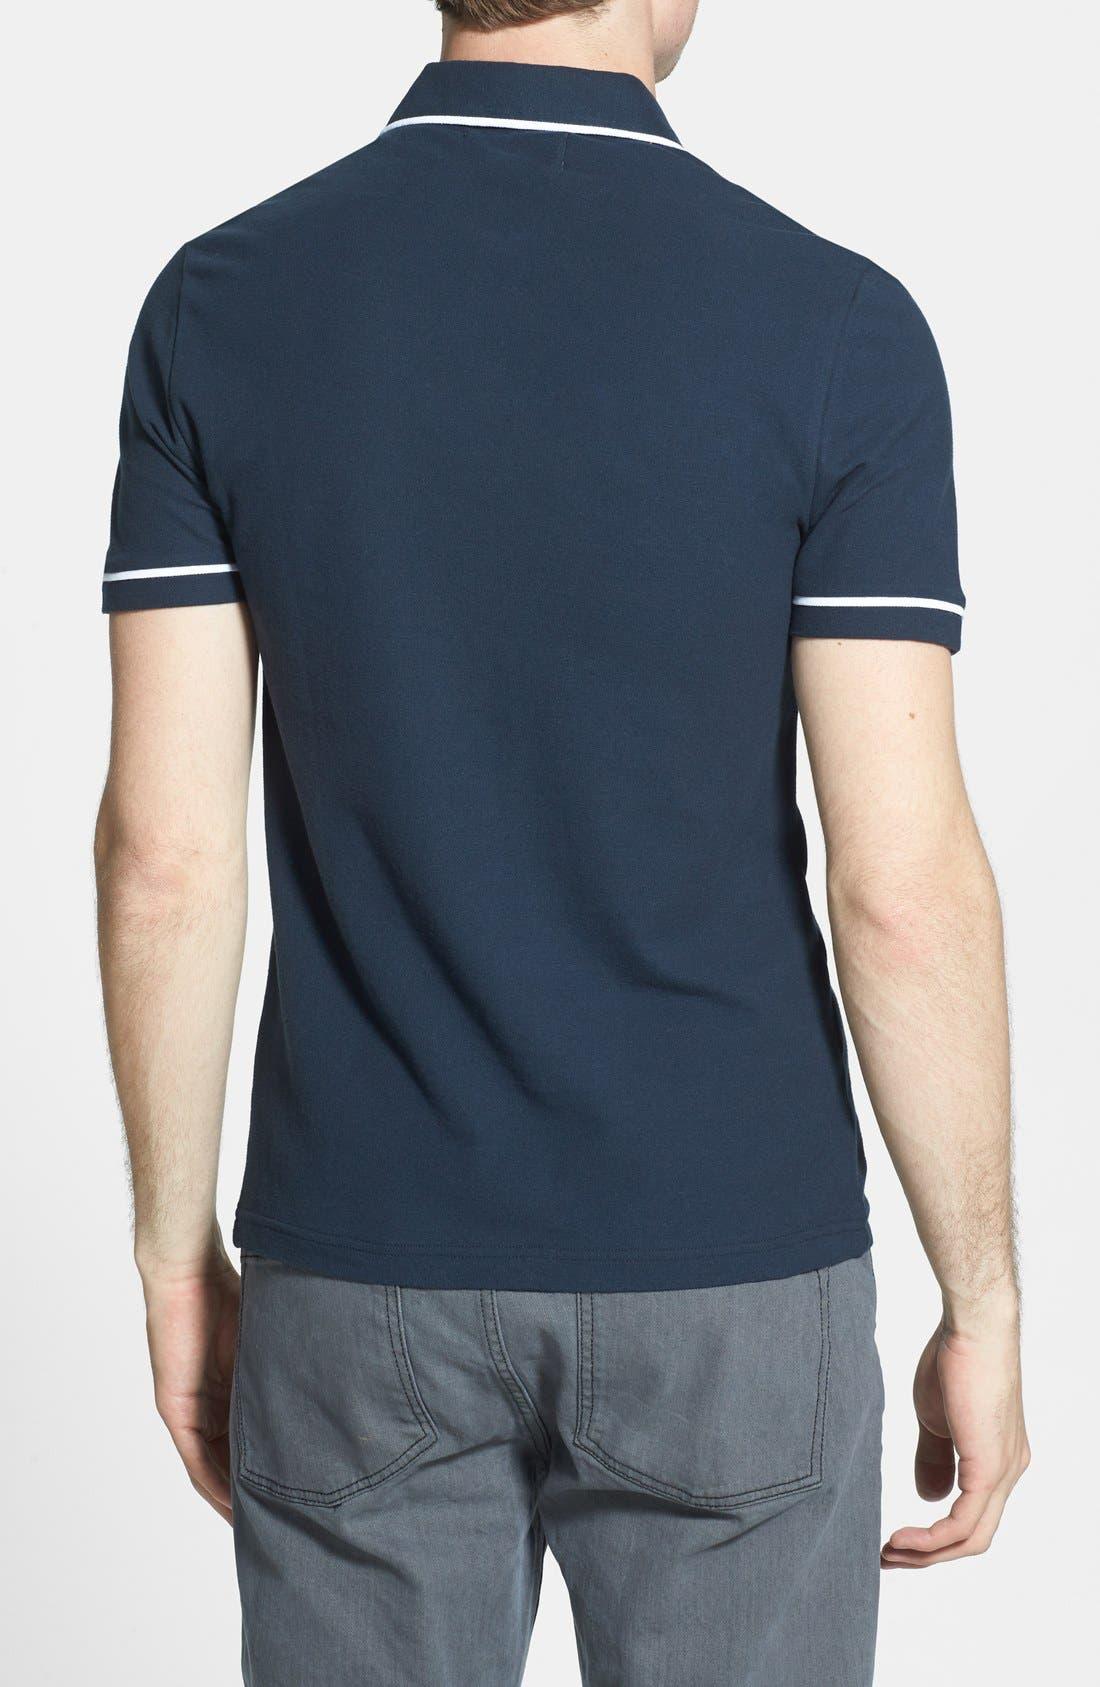 dd9512e1 Adidas Originals Argyle Polo T Shirt White - Nils Stucki Kieferorthopäde